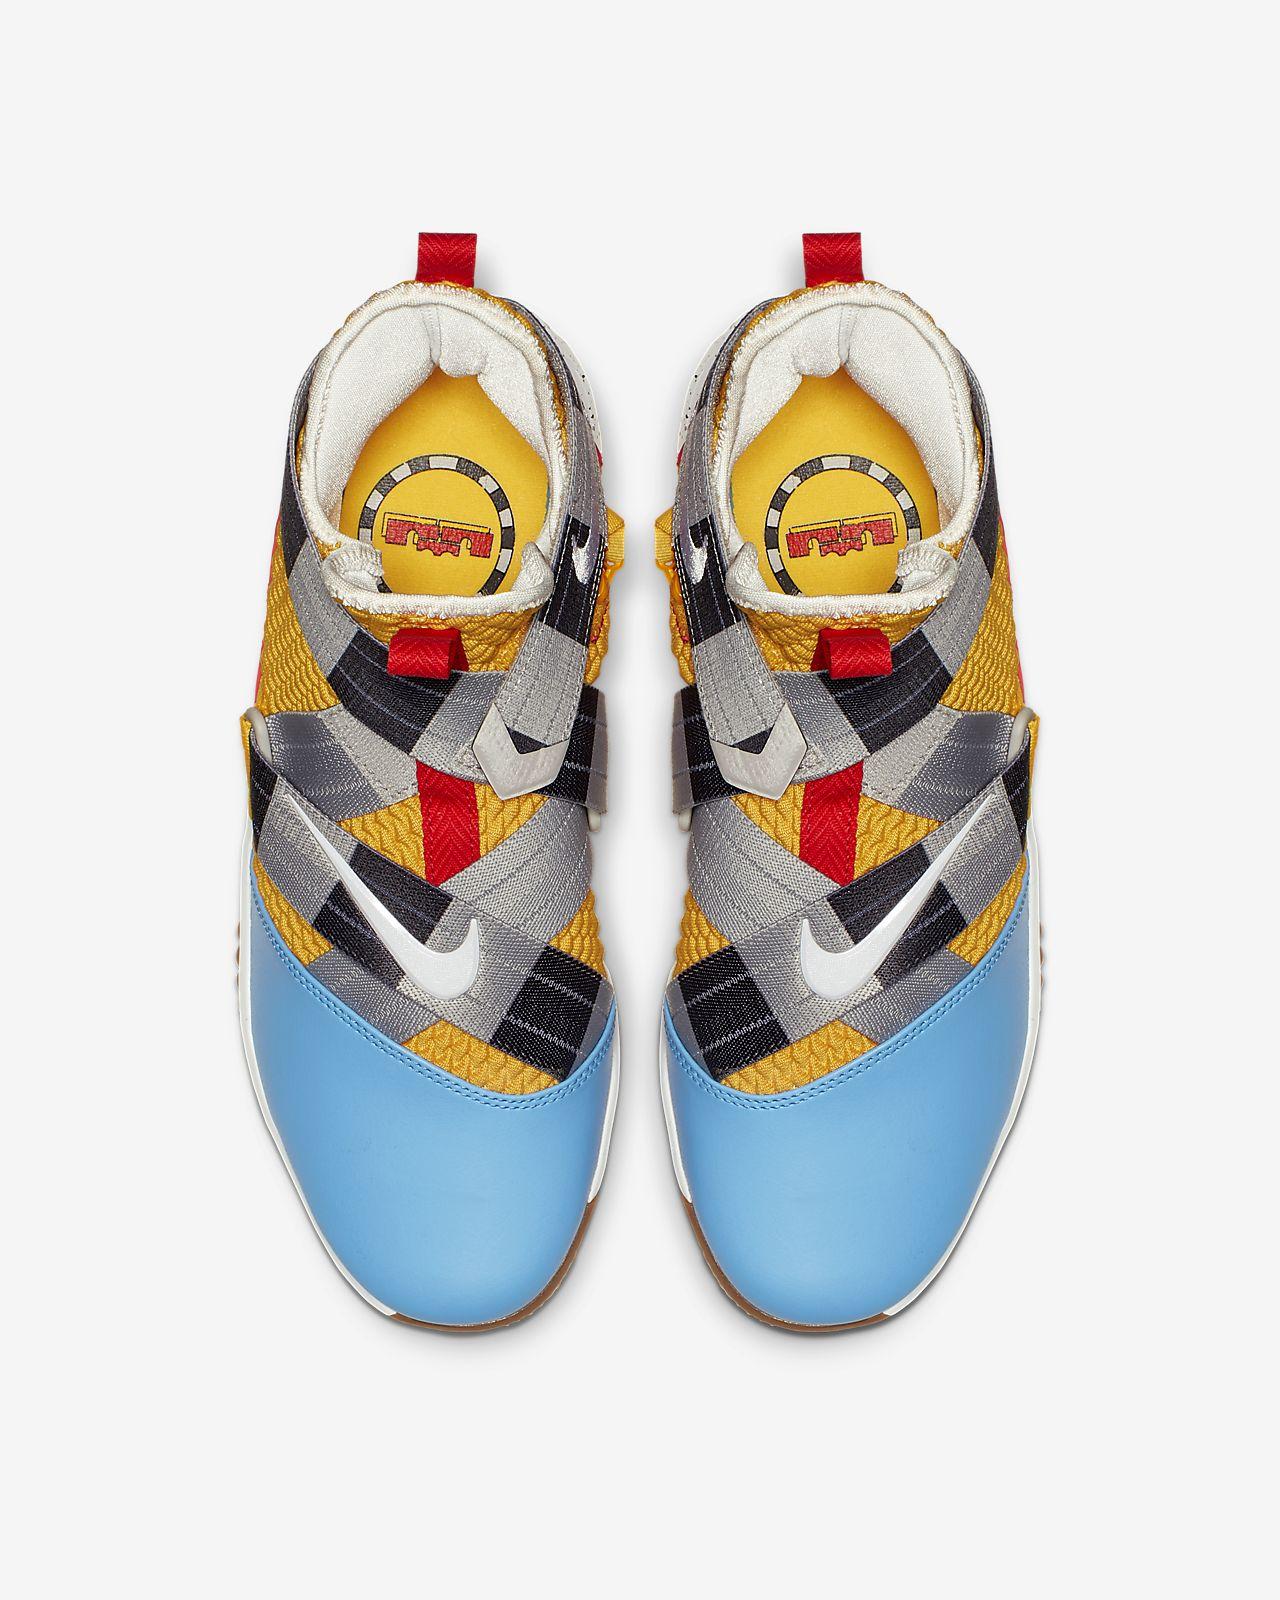 5eeea8930e9 LeBron Soldier 12 FlyEase (Extra-Wide) Men s Basketball Shoe. Nike.com